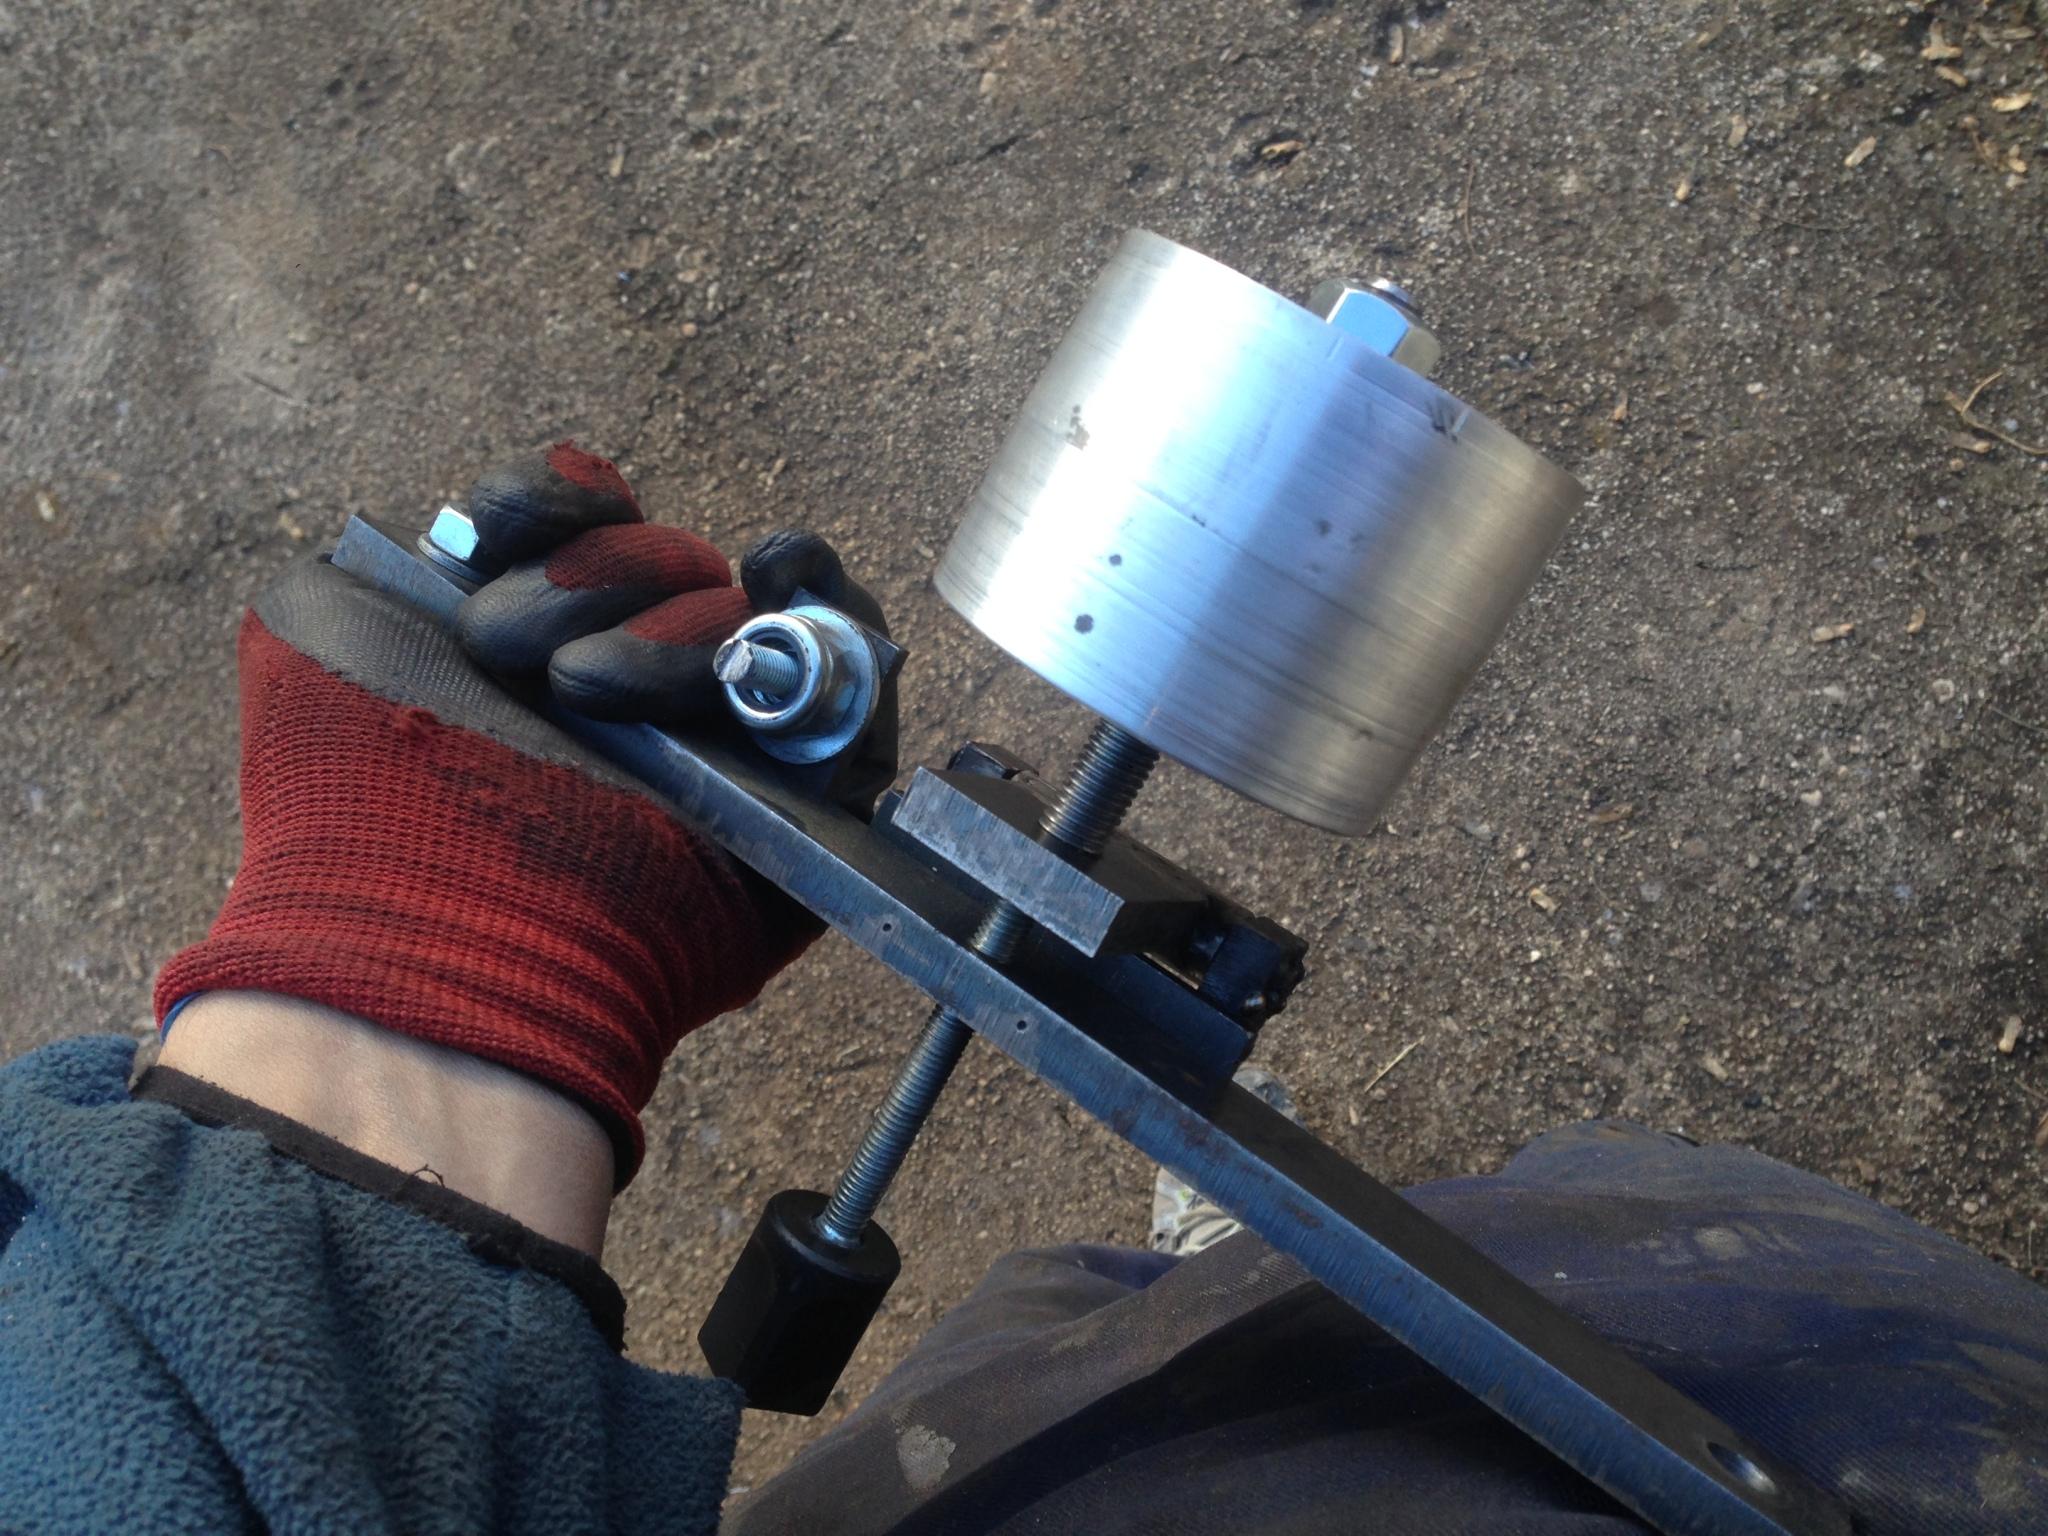 Belt grinder Replika KMG I1mfmc